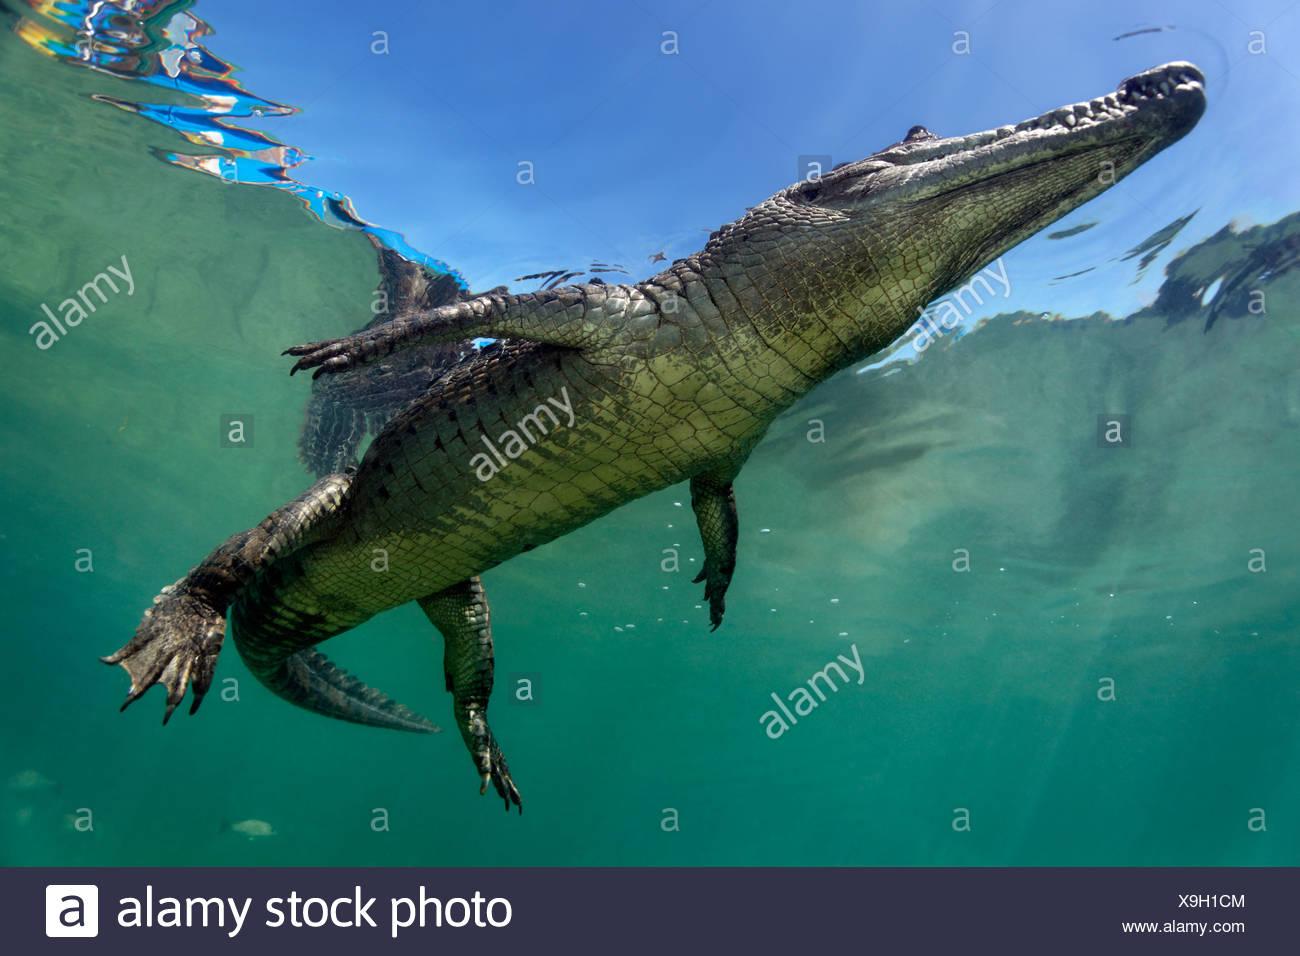 Saltwater Crocodile or Estuarine Crocodile or Indo-Pacific Crocodile (Crocodylus porosus), underwater, swimming close to surface - Stock Image